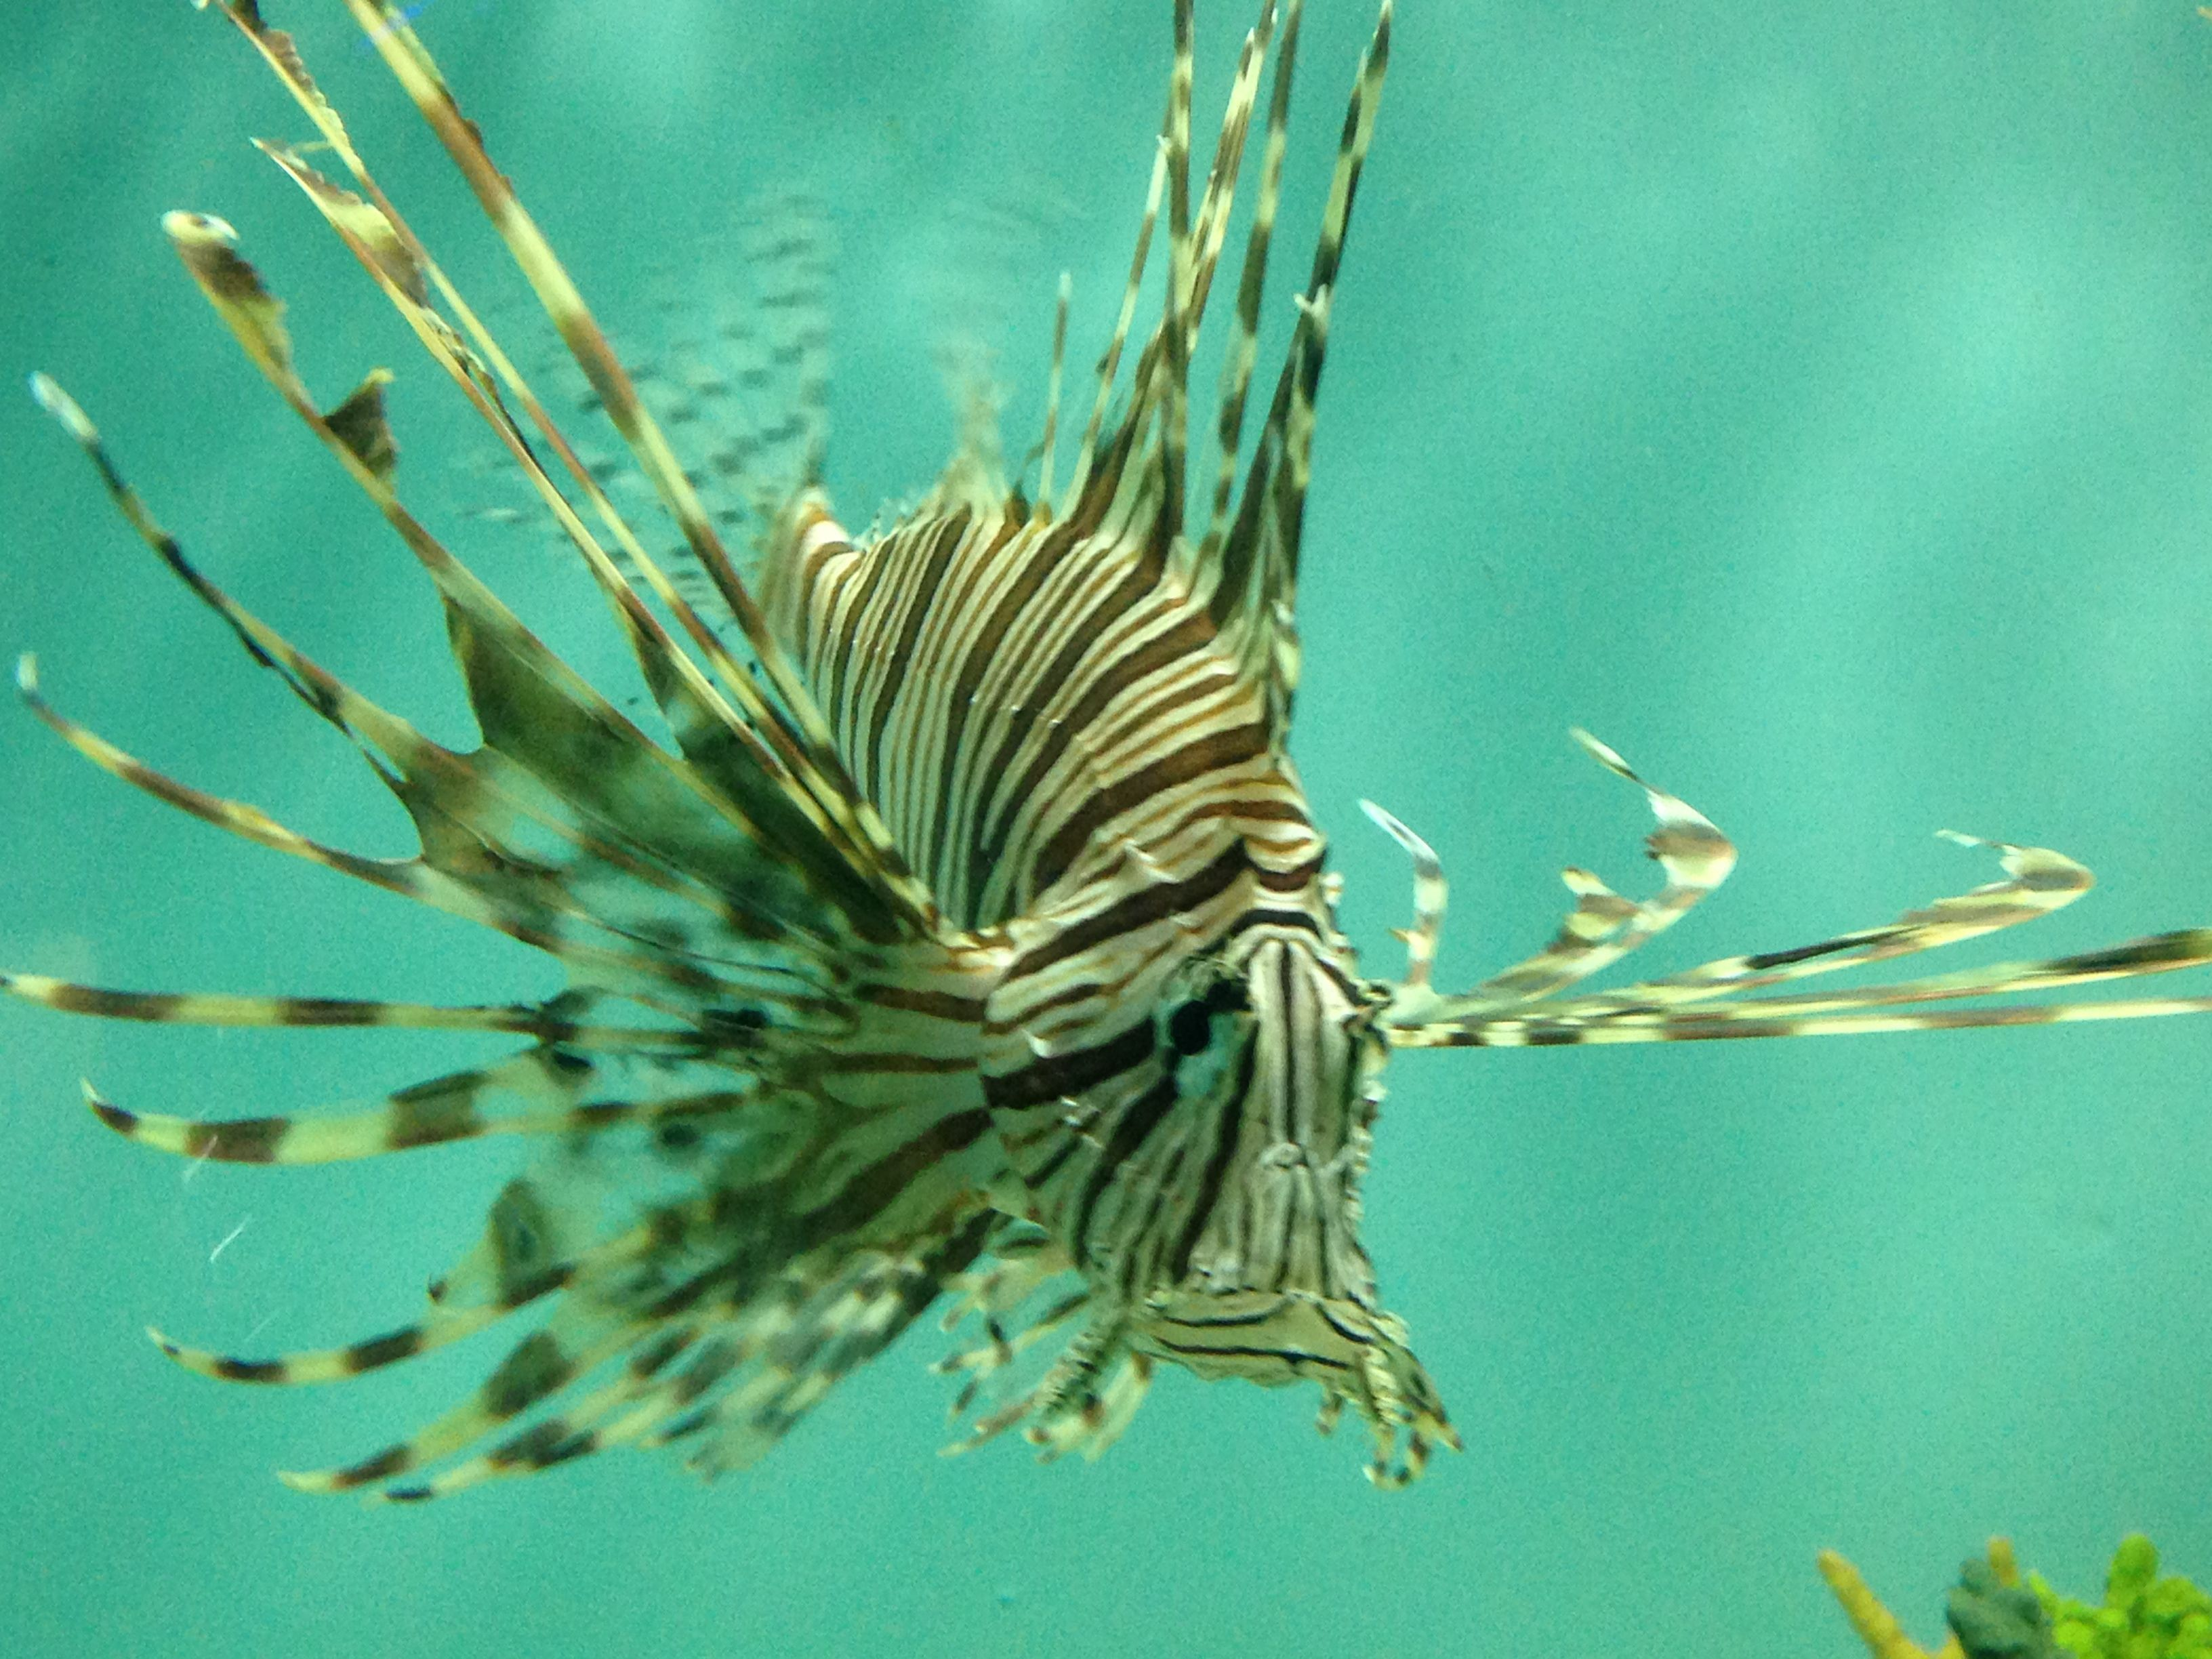 Fish aquarium in niagara falls - Lion Fish At Niagara Falls Aquarium